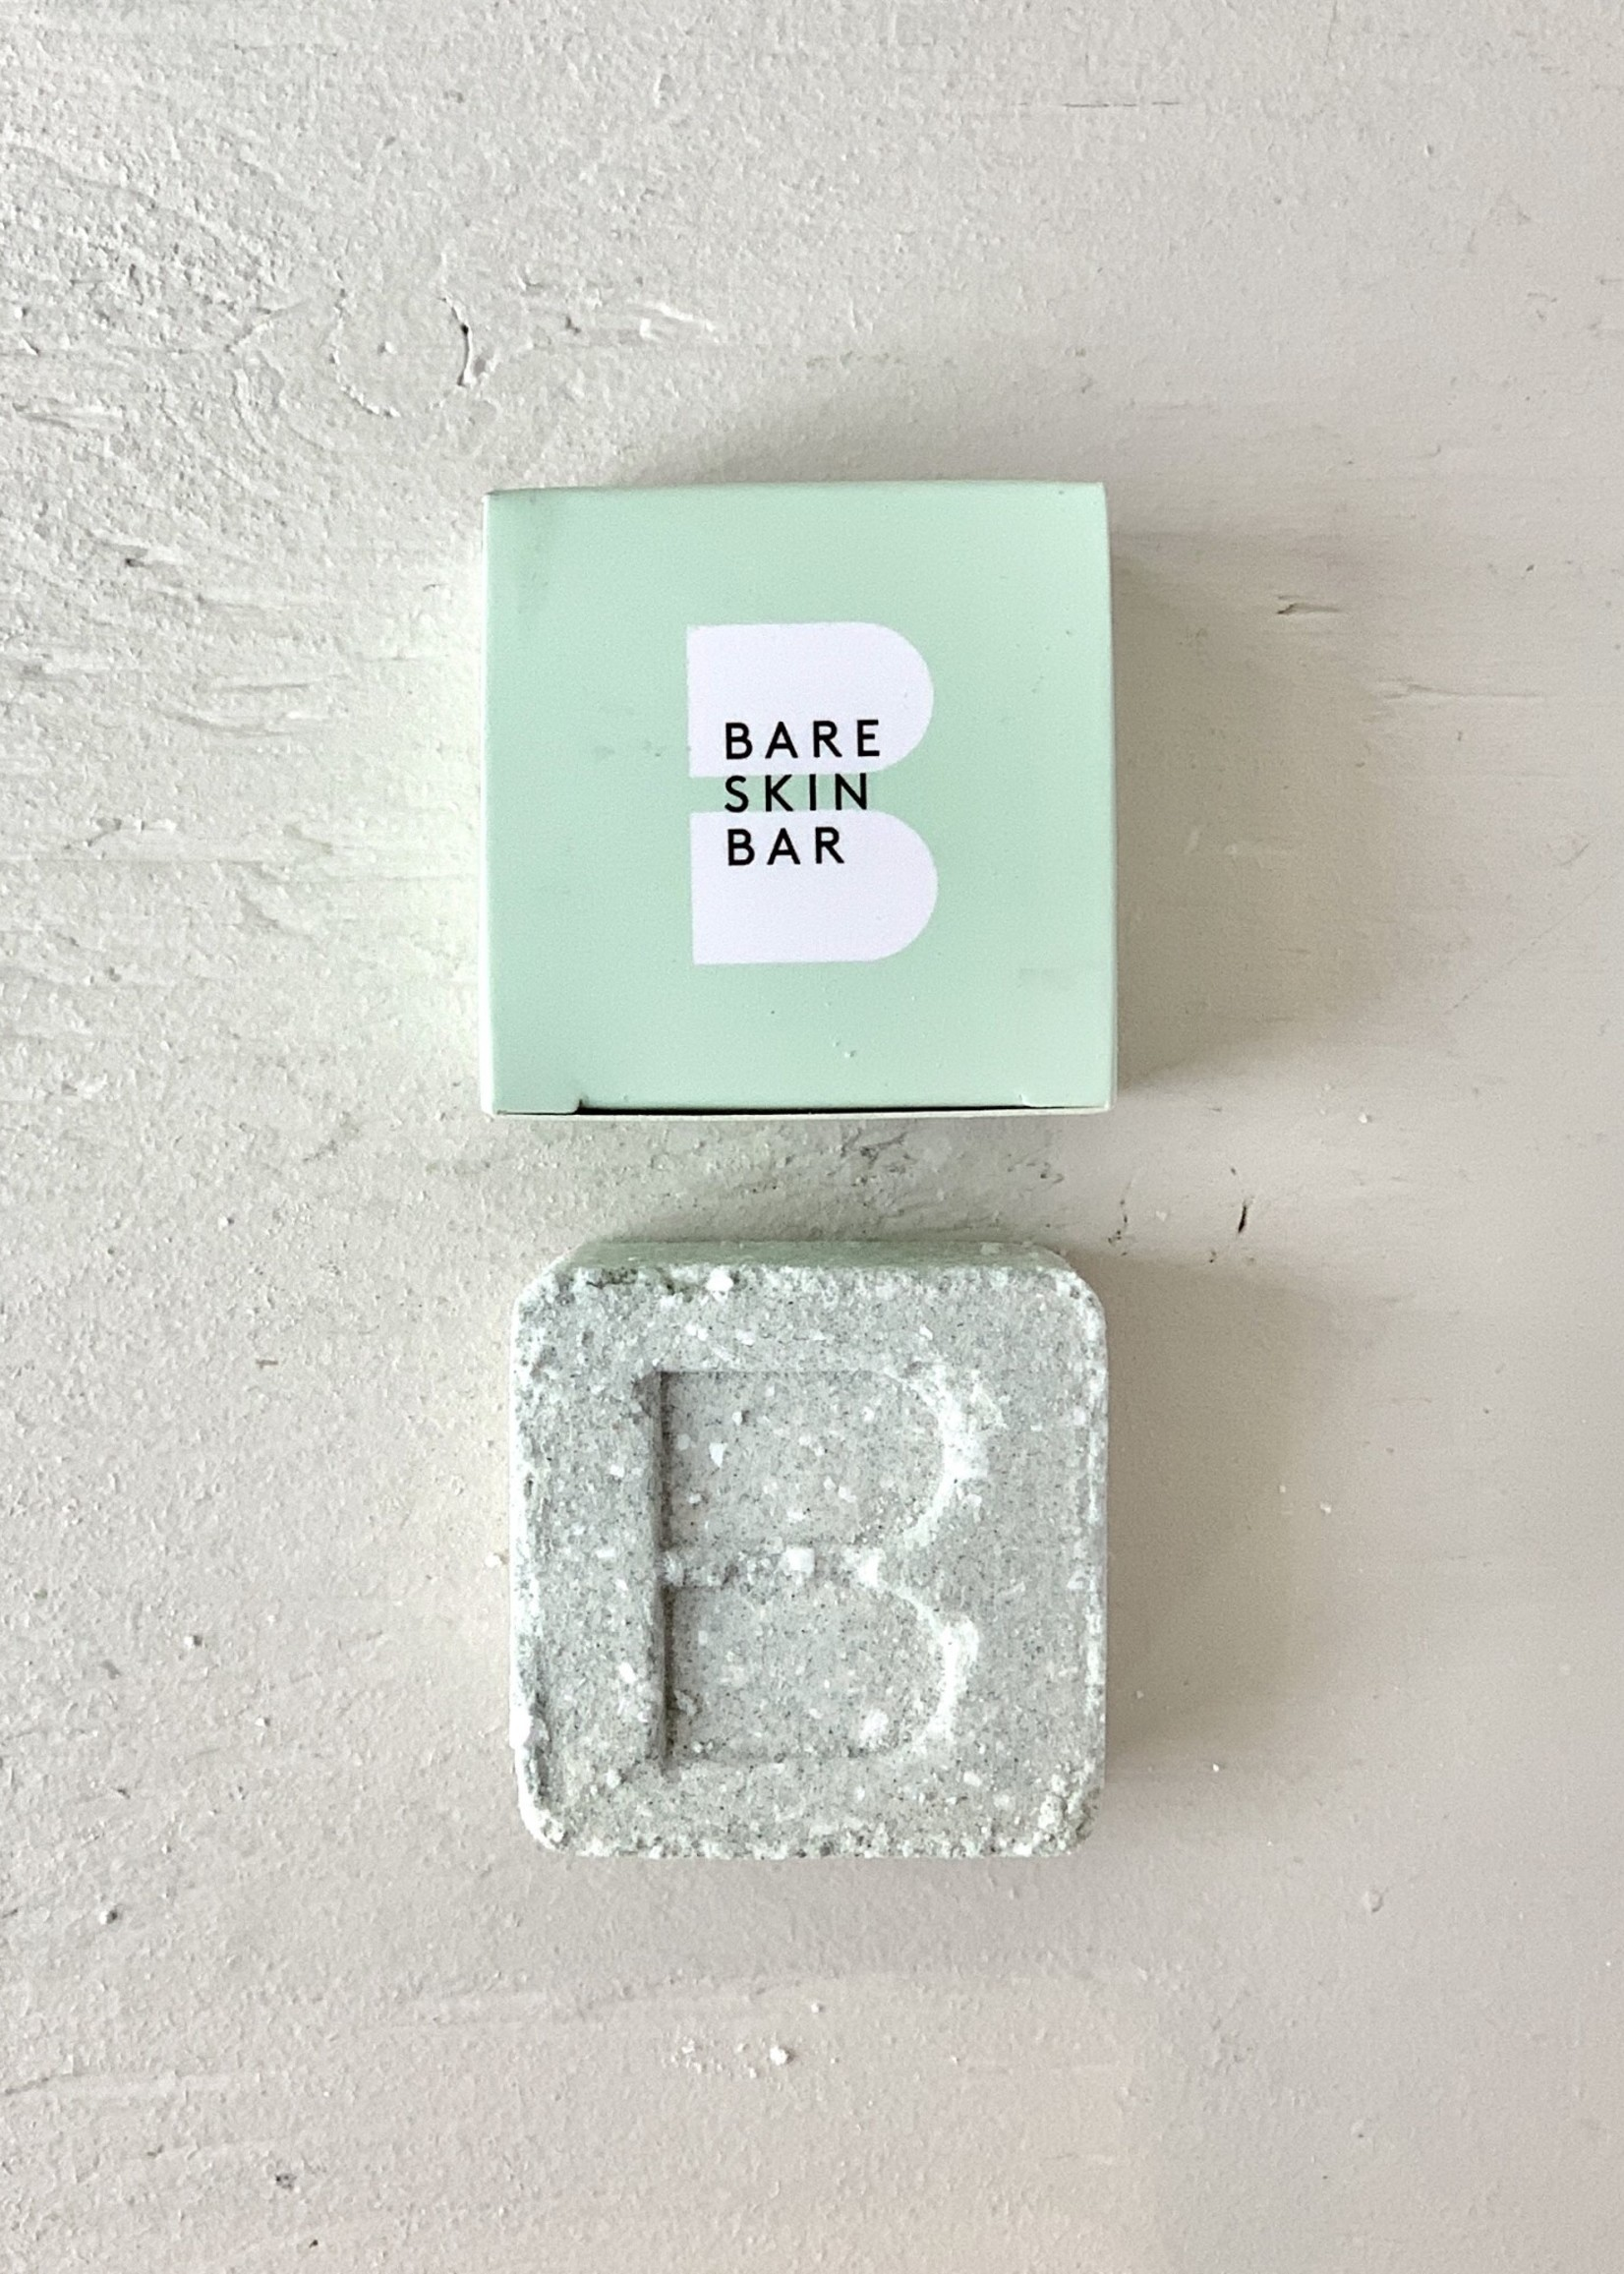 Bareskin Bar Bath Bars